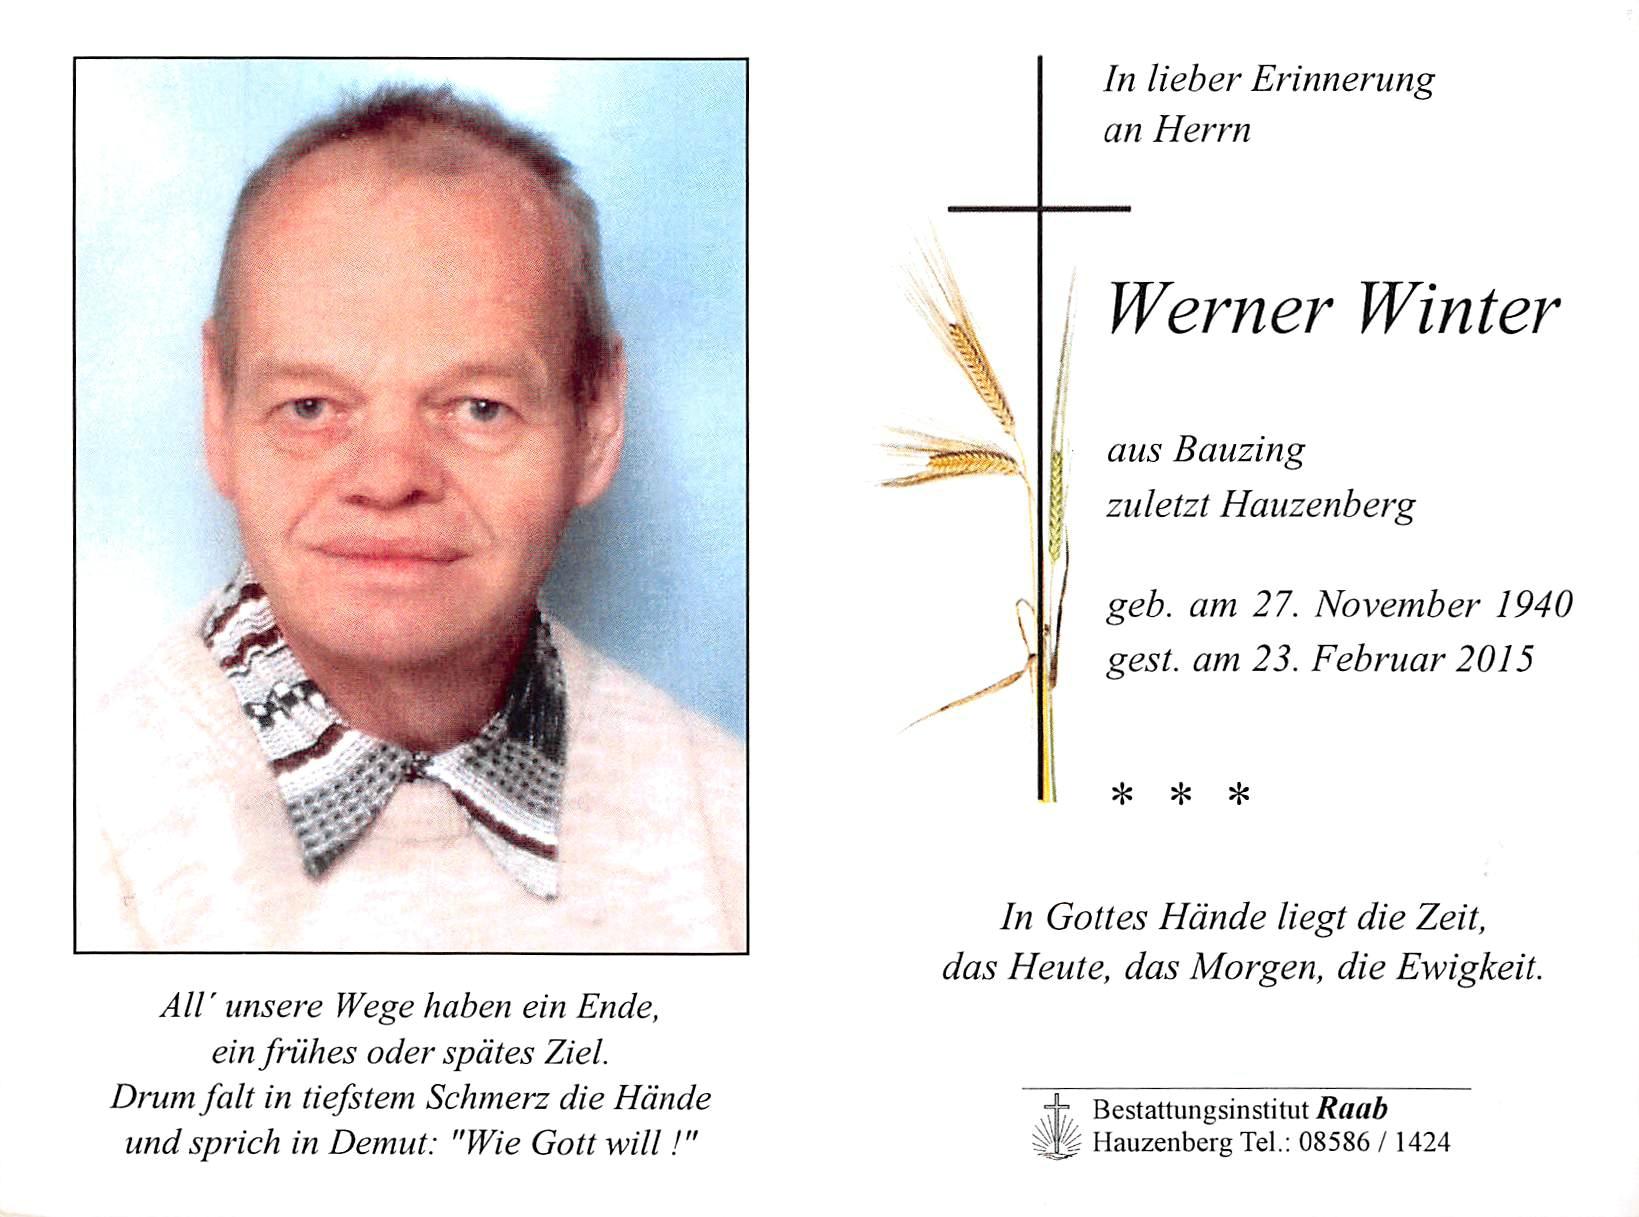 2015-02-23-Winter-Werner-Susi-Bauzing